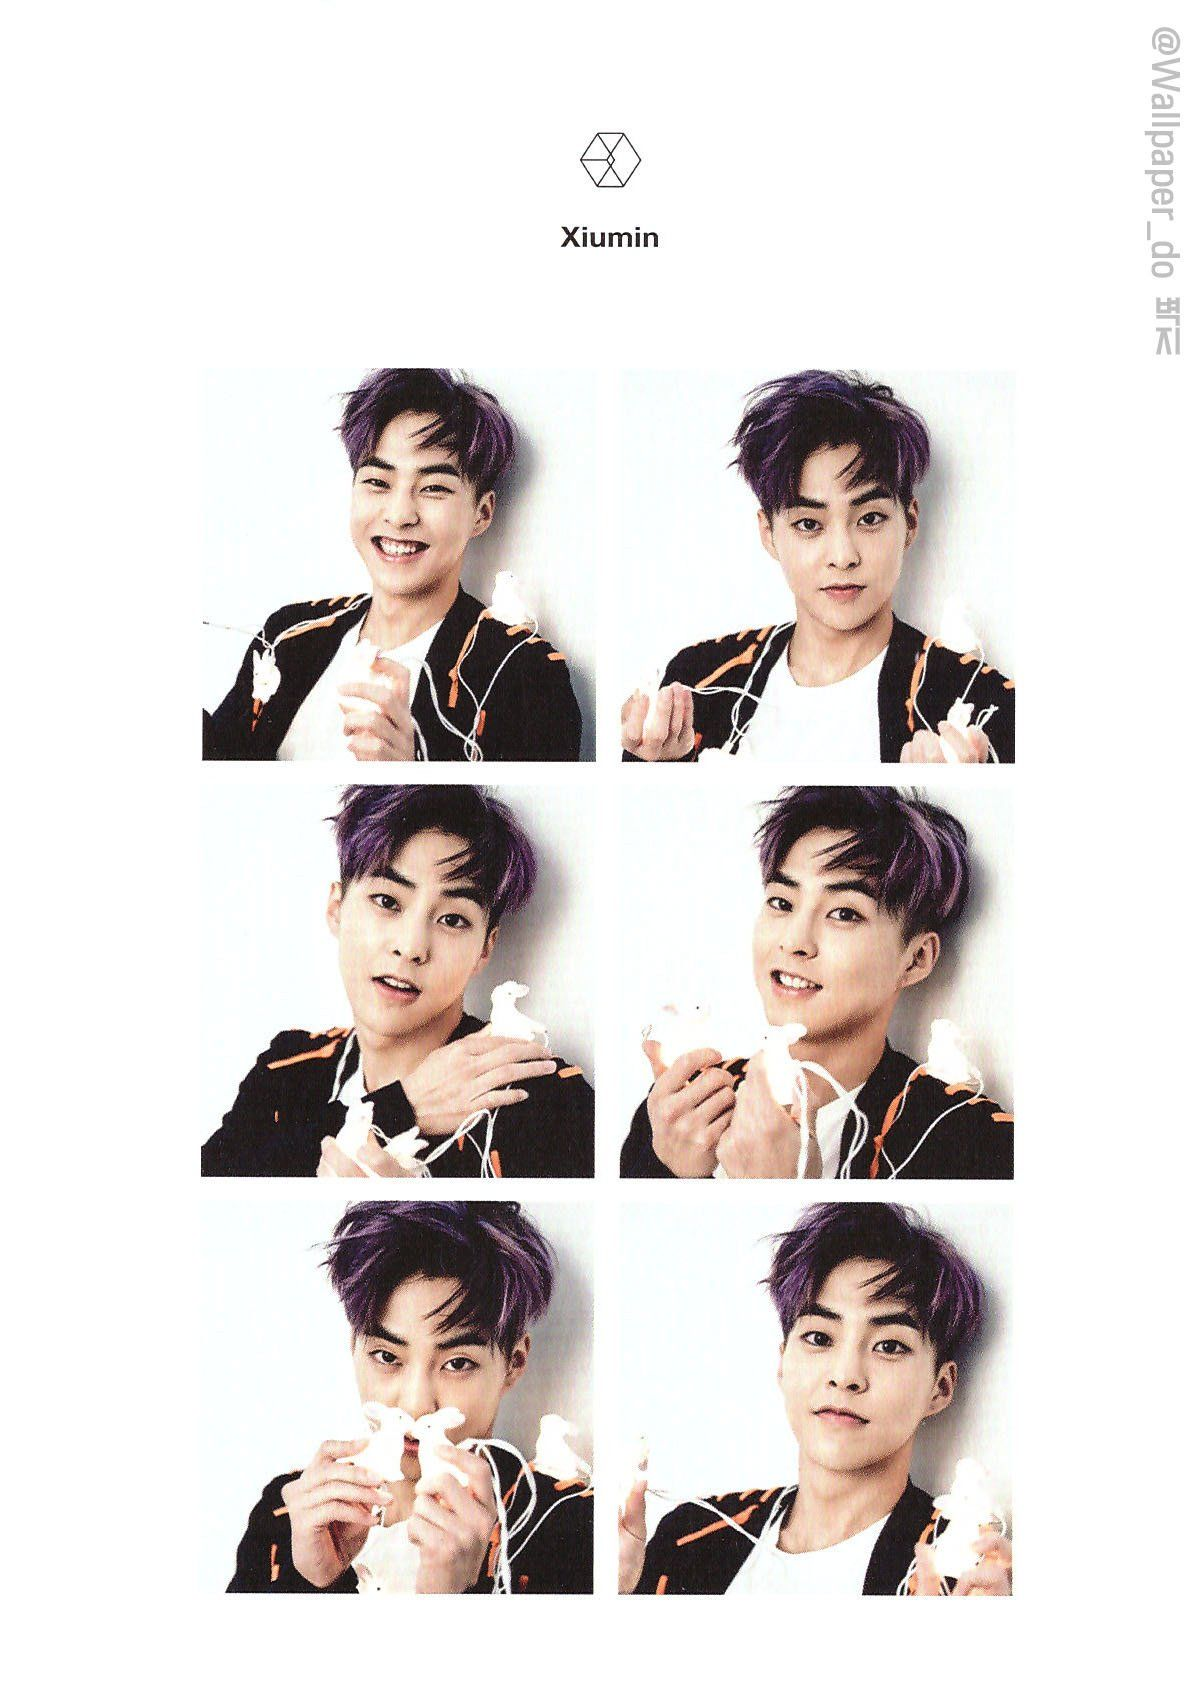 Handsome Cute Xiumin Minseok Exo